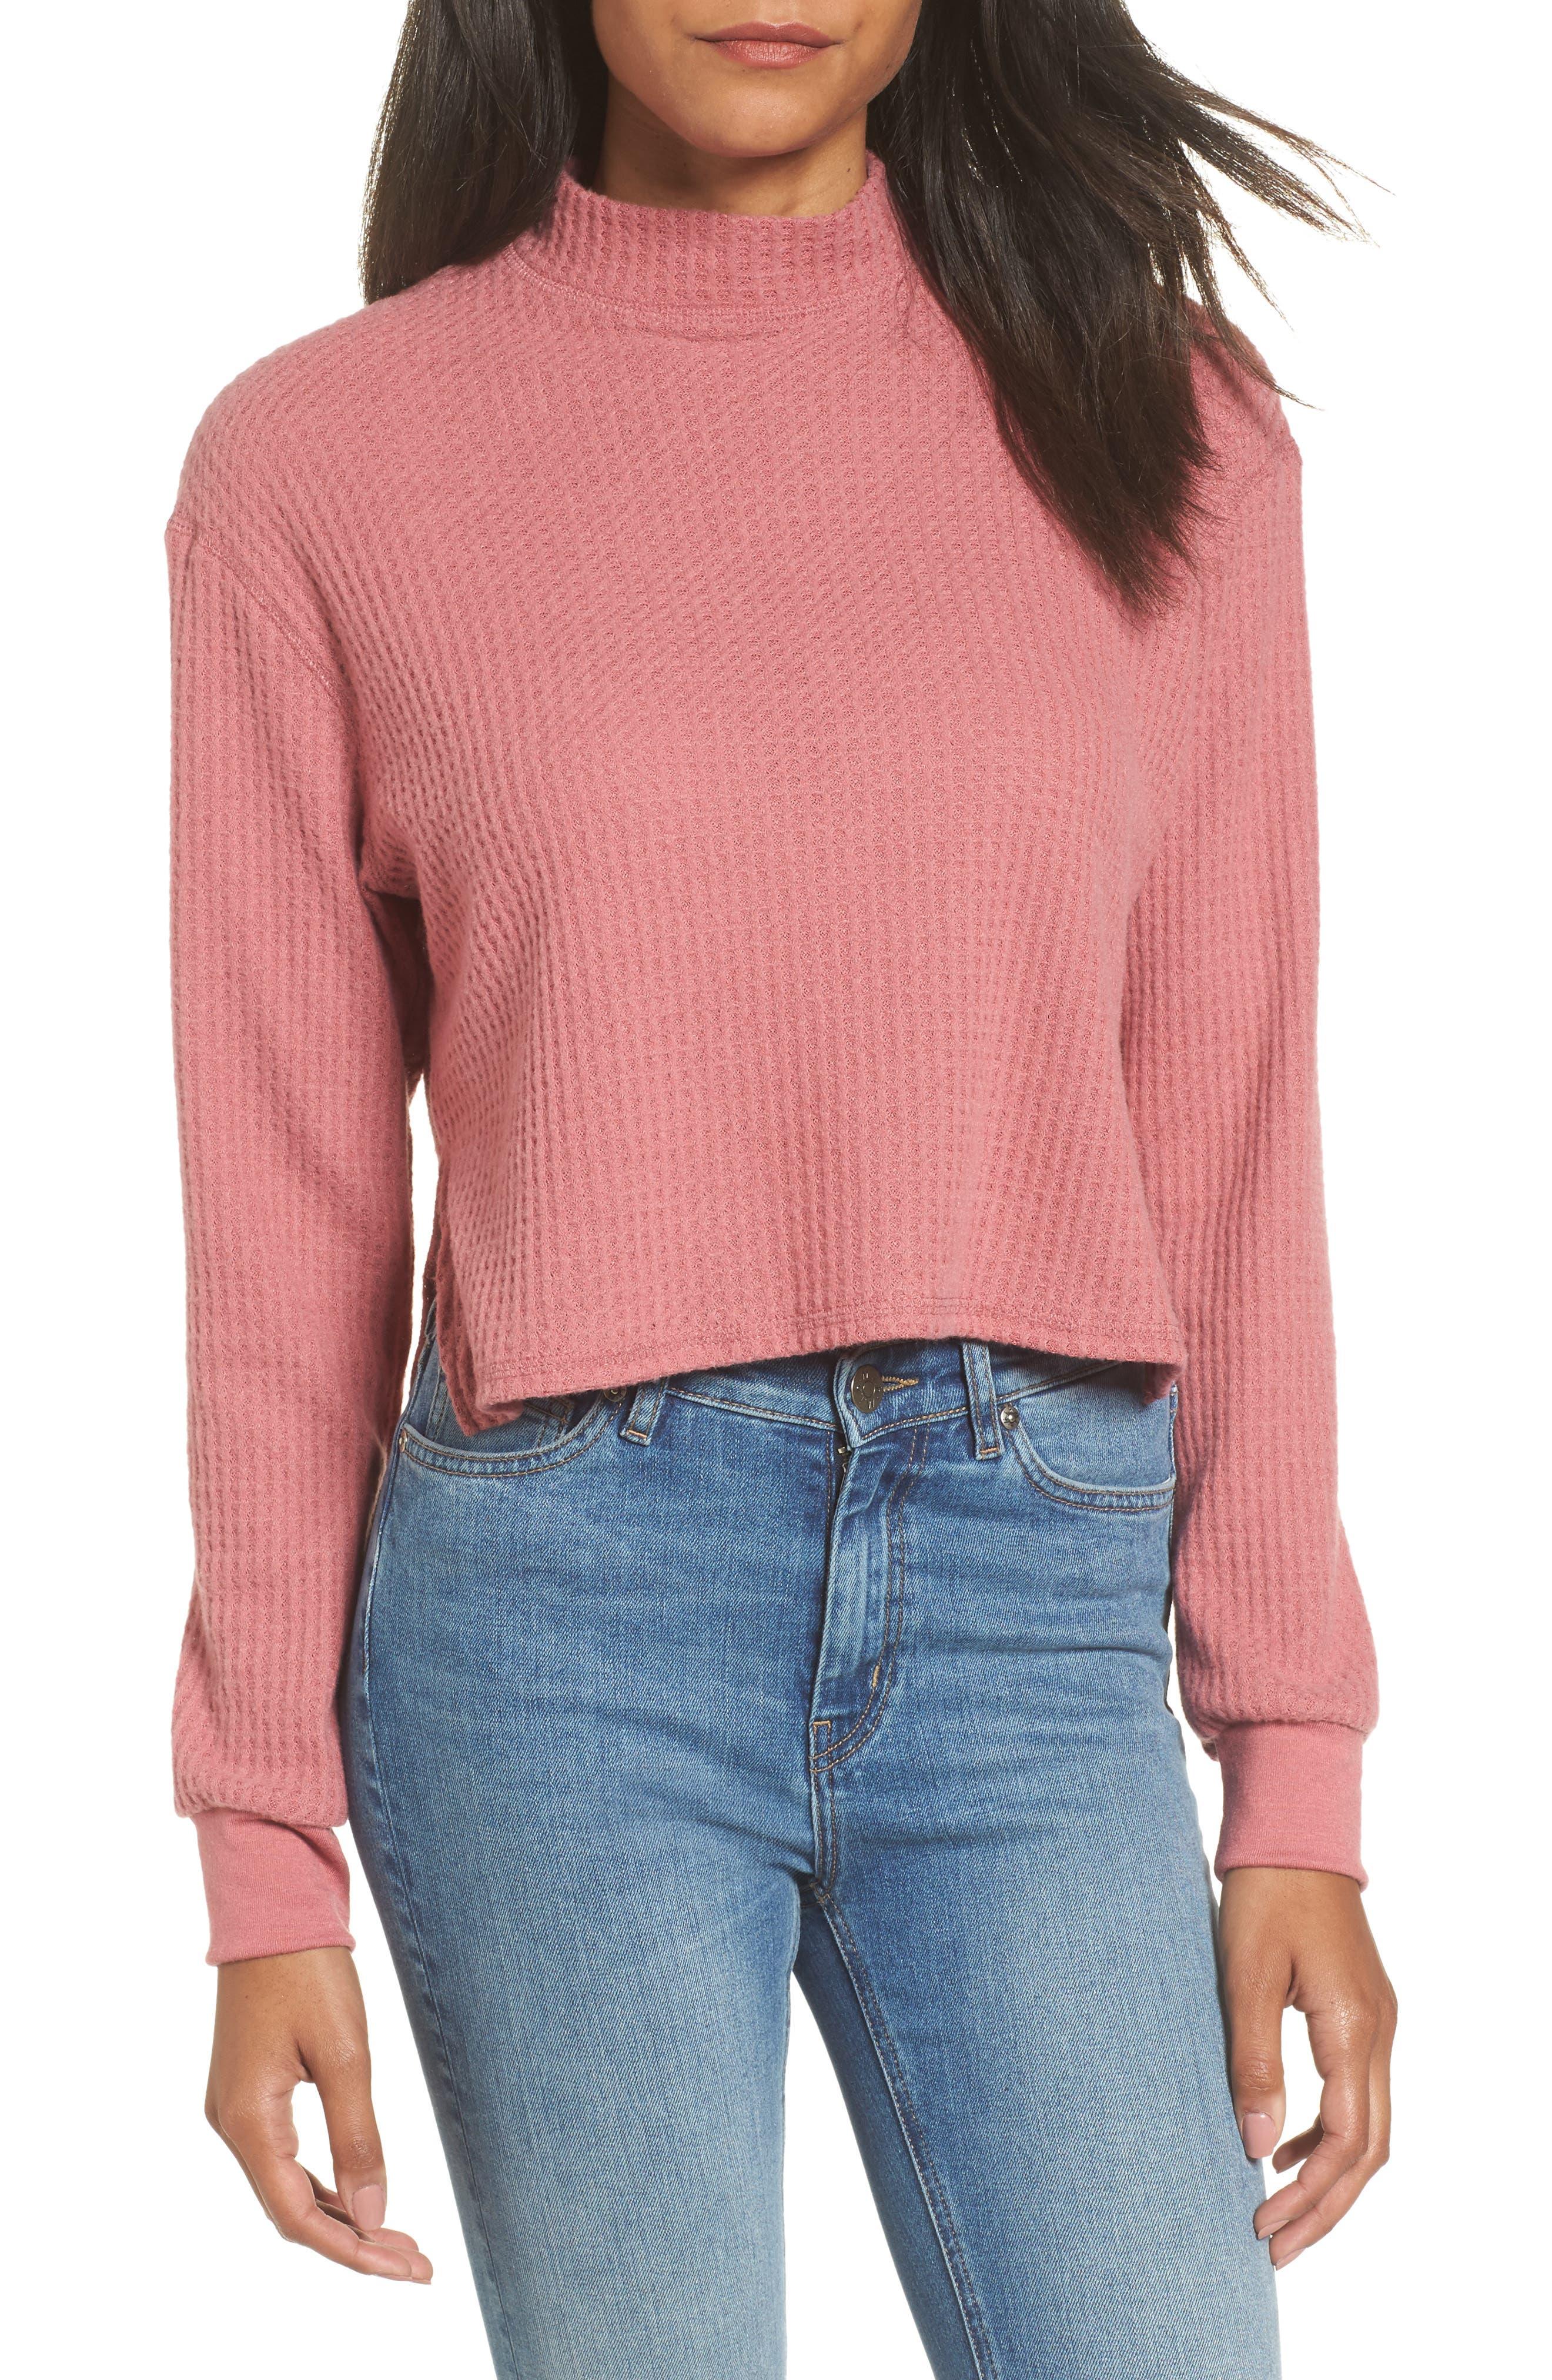 Thermal Crop Top,                         Main,                         color, Velvet Blush